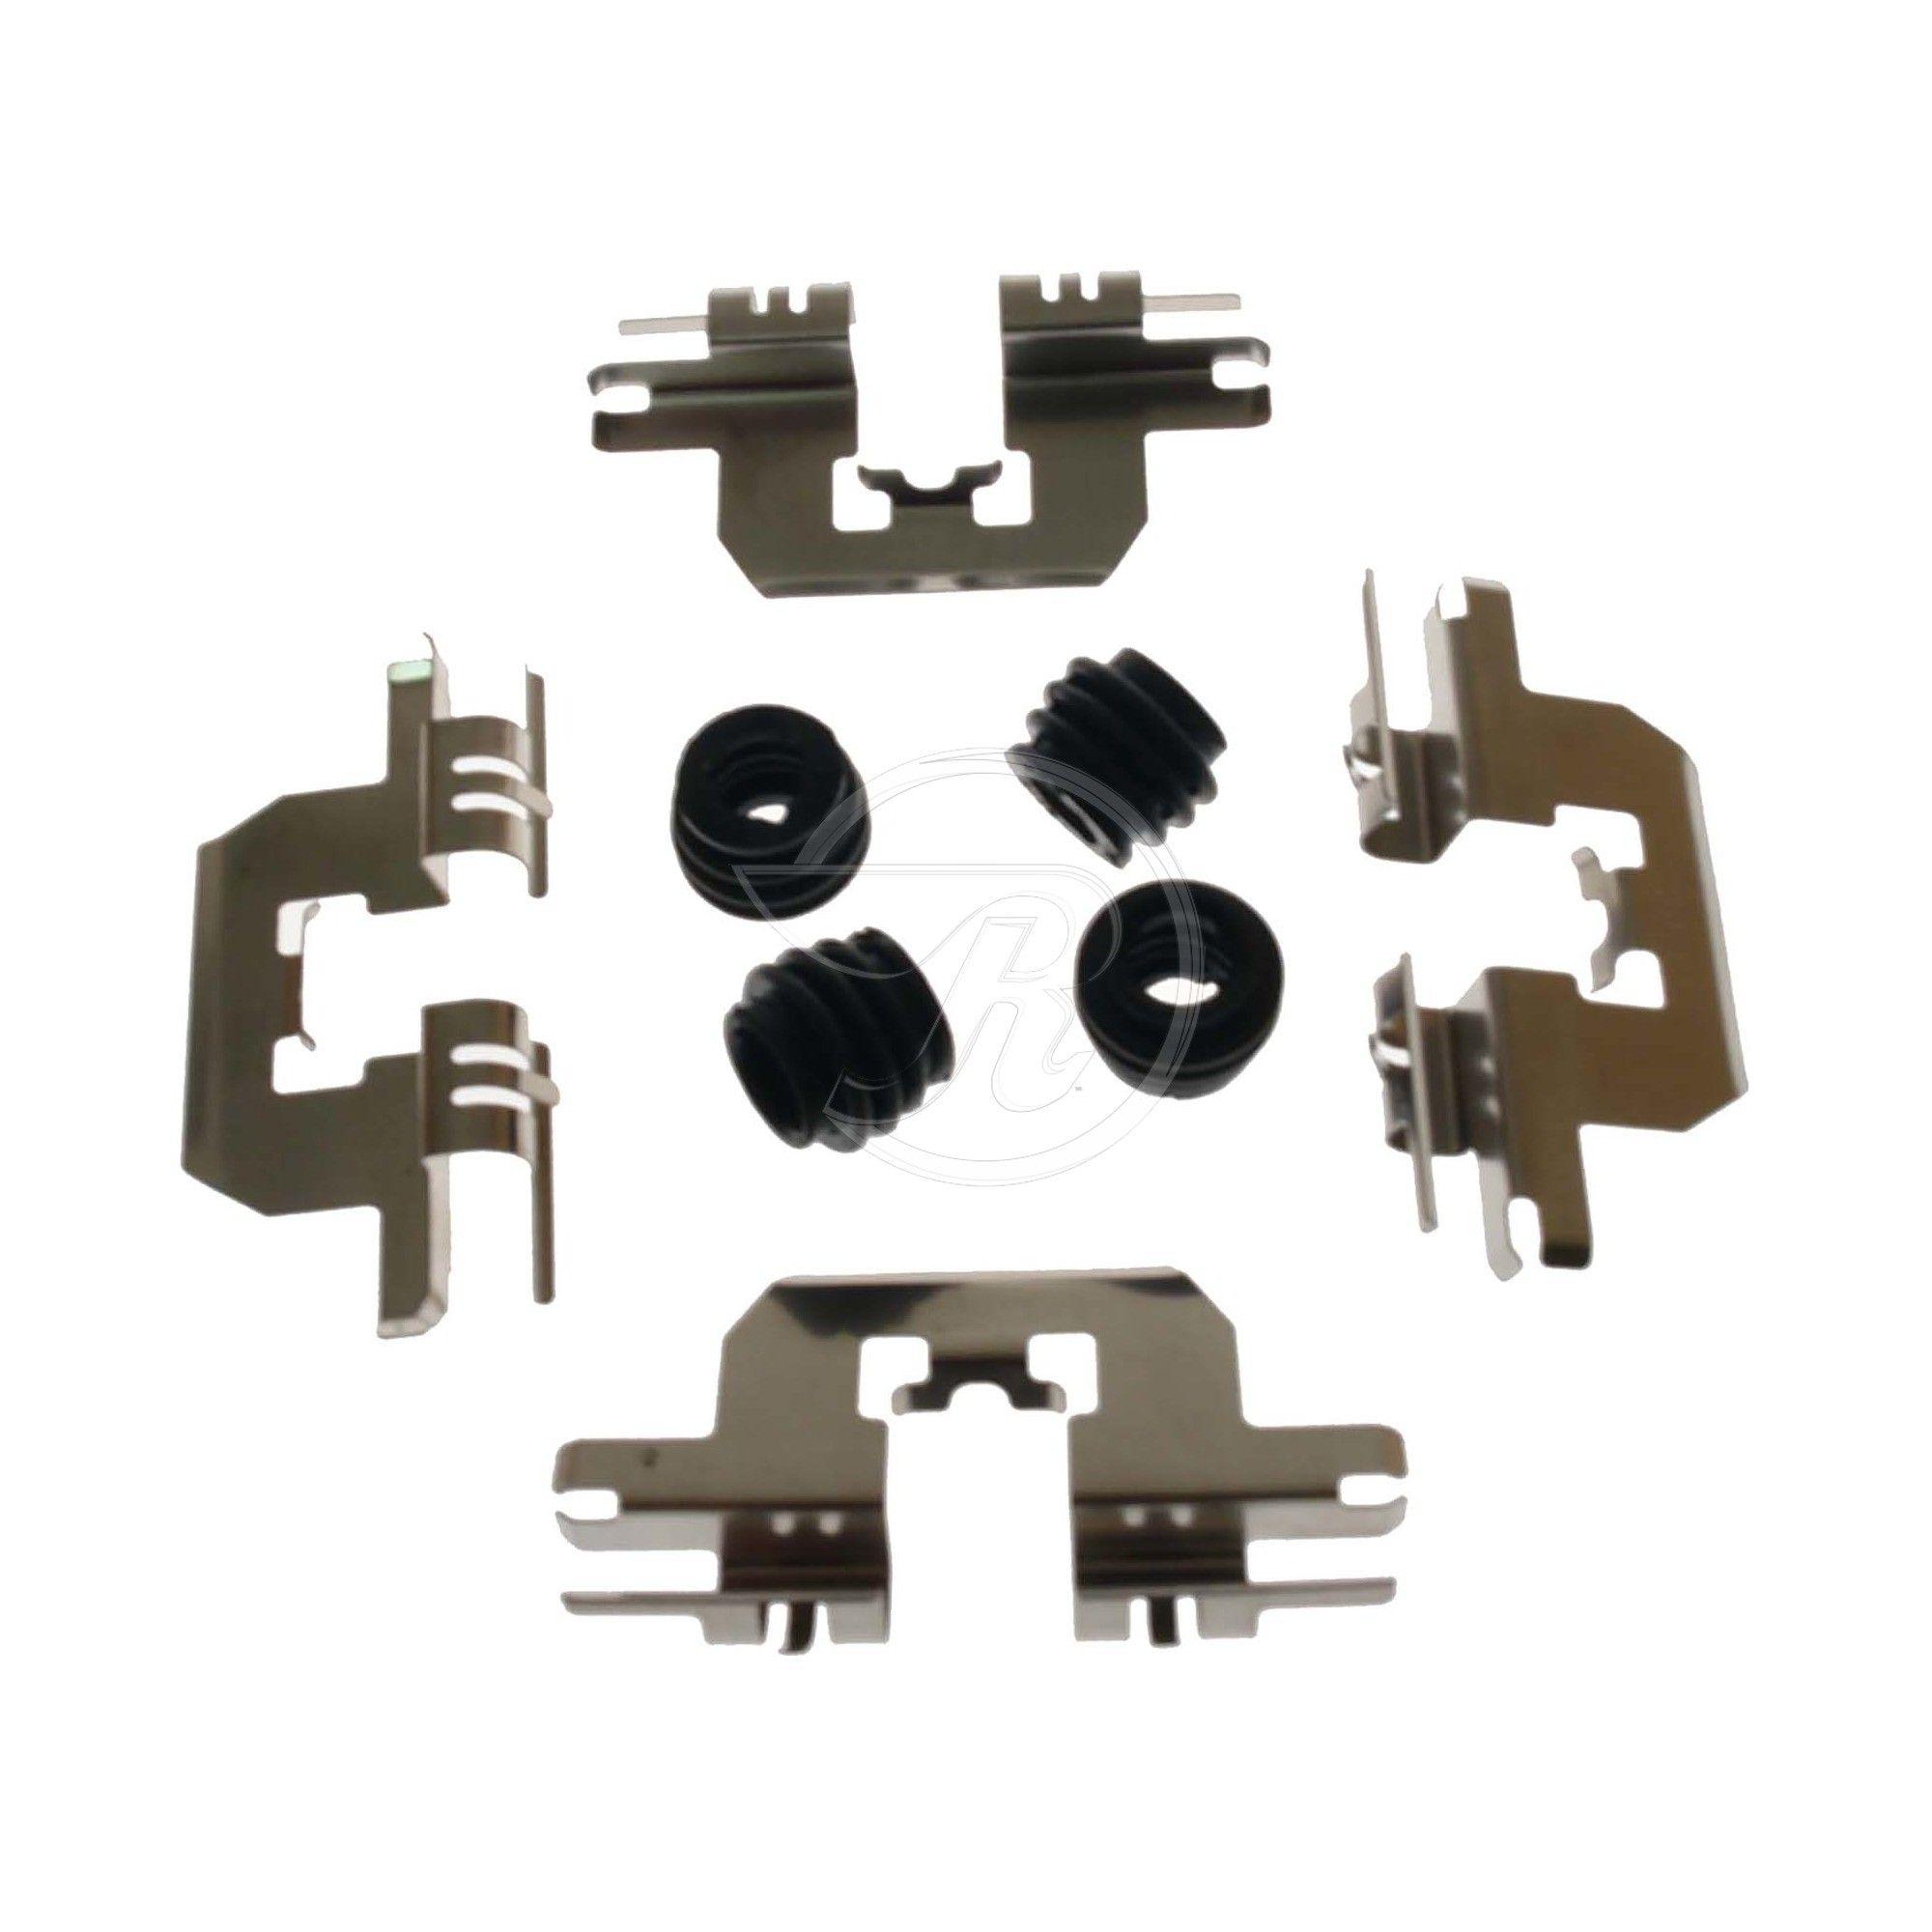 BECKARNLEY 084-2133 Disc Brake Hardware Kit